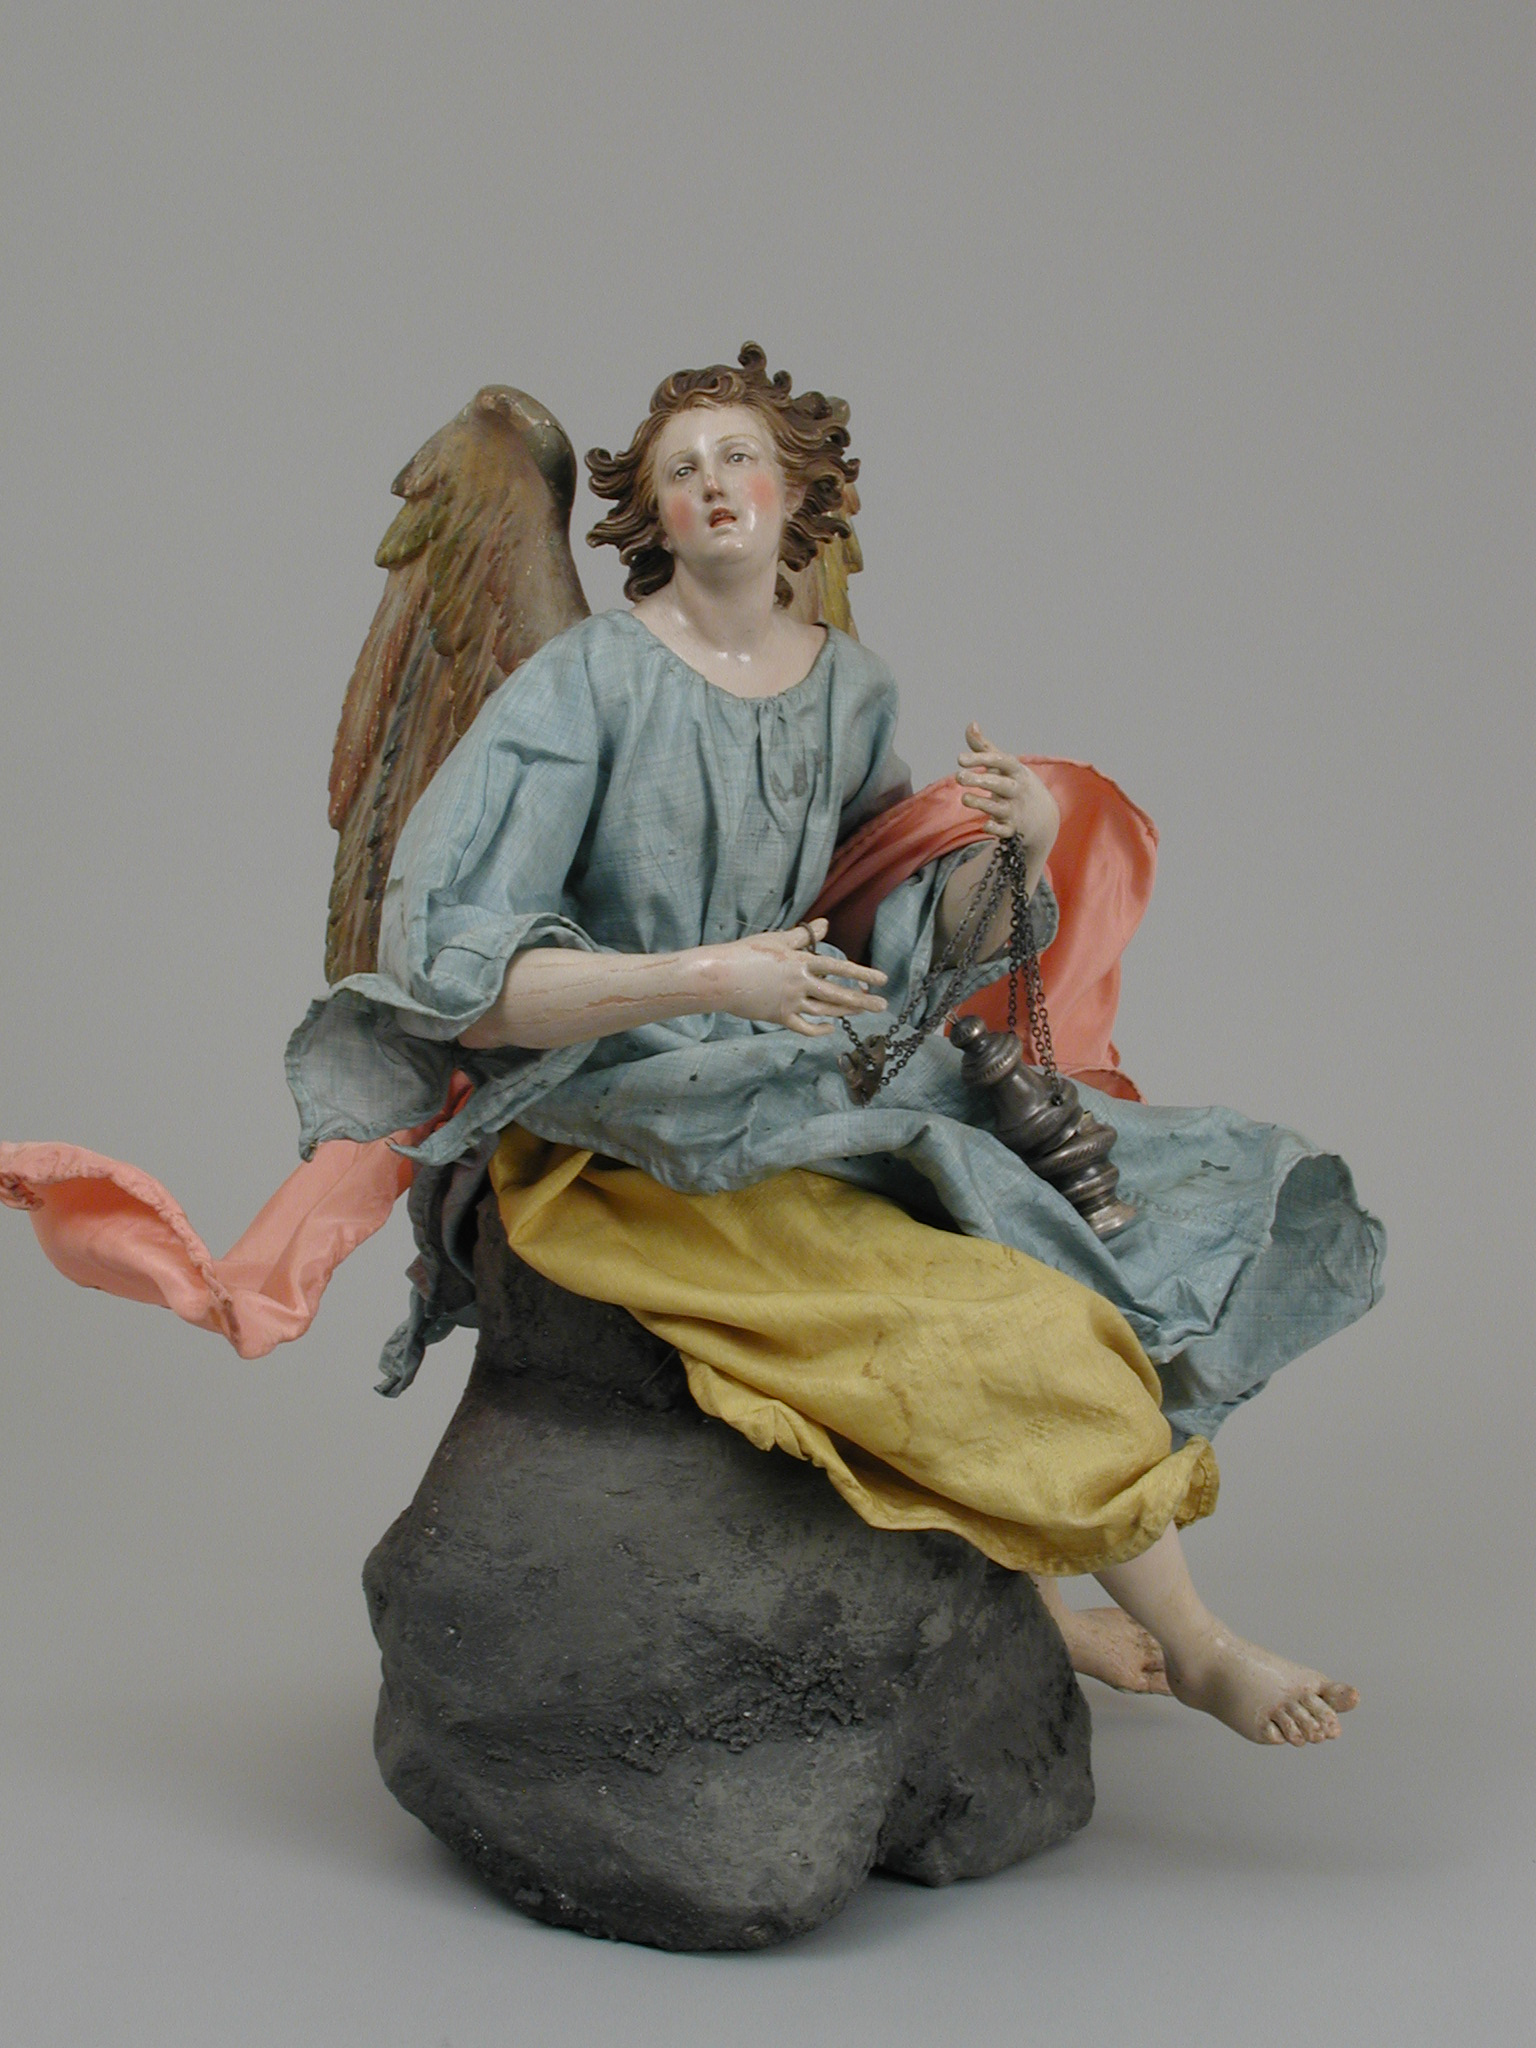 https://images.metmuseum.org/CRDImages/es/original/LC-64_164_51.jpg